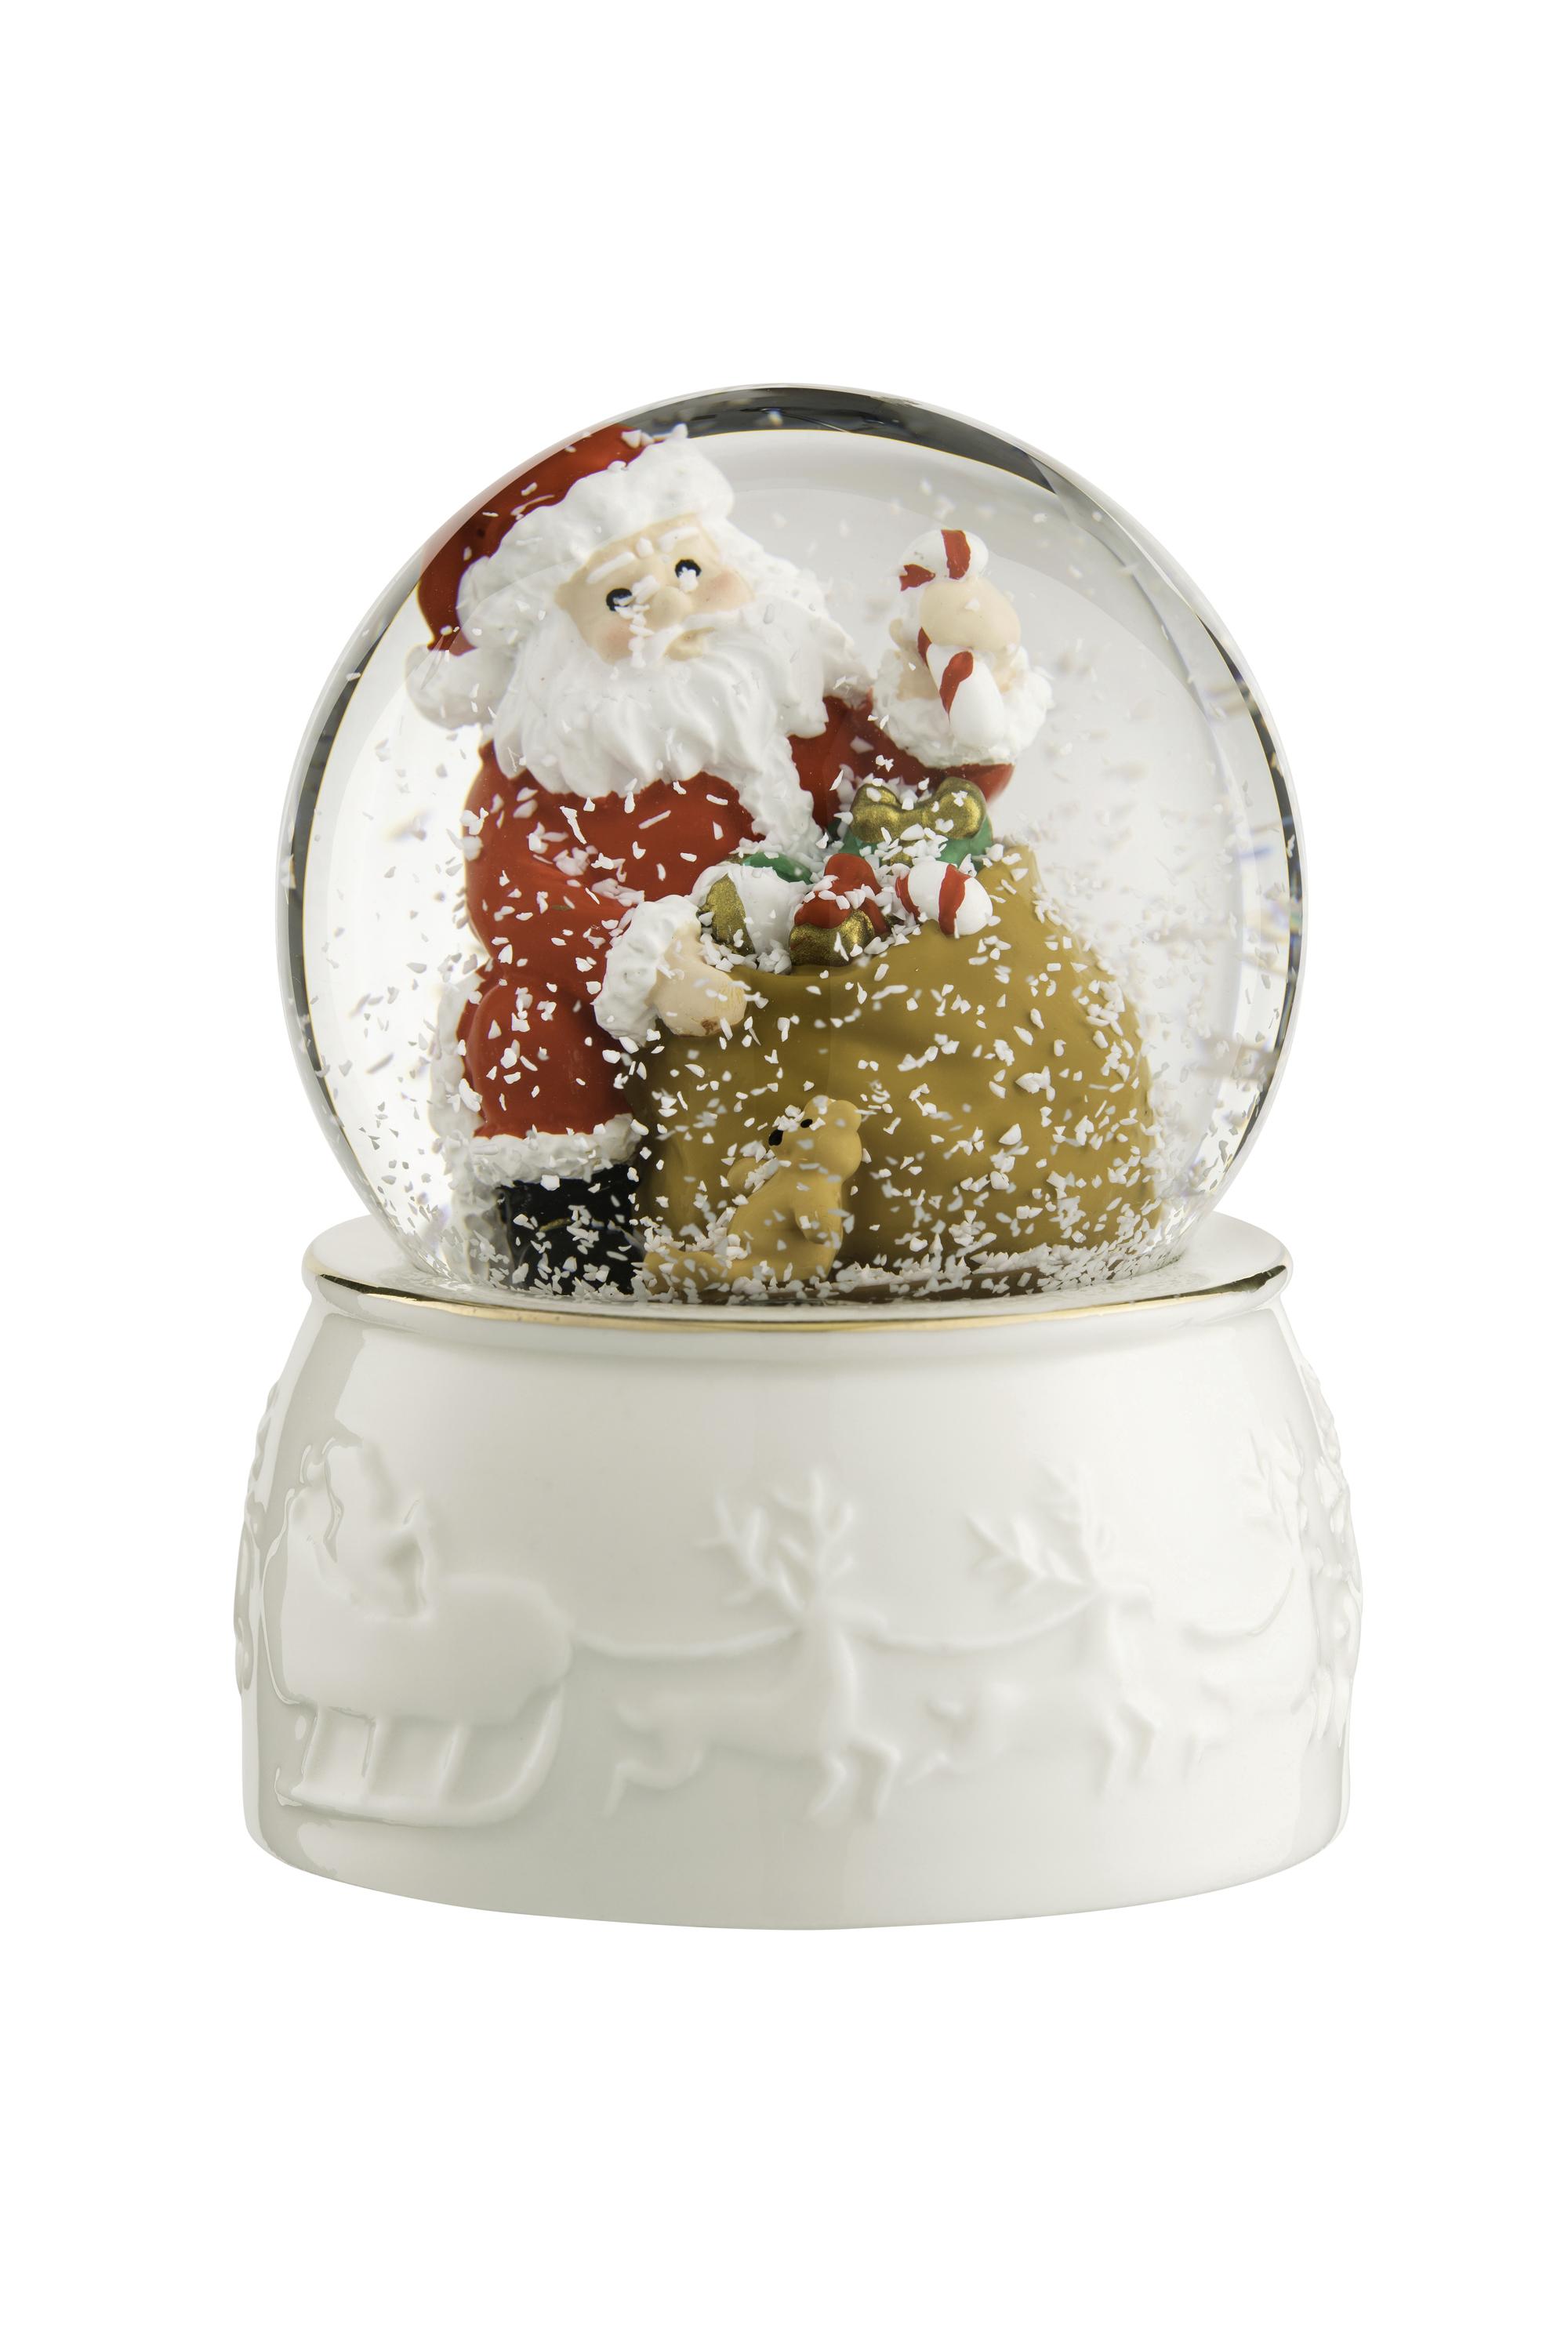 Irish Christmas - Belleek Santa Snowglobe at IrishShop.com | HMBL10288